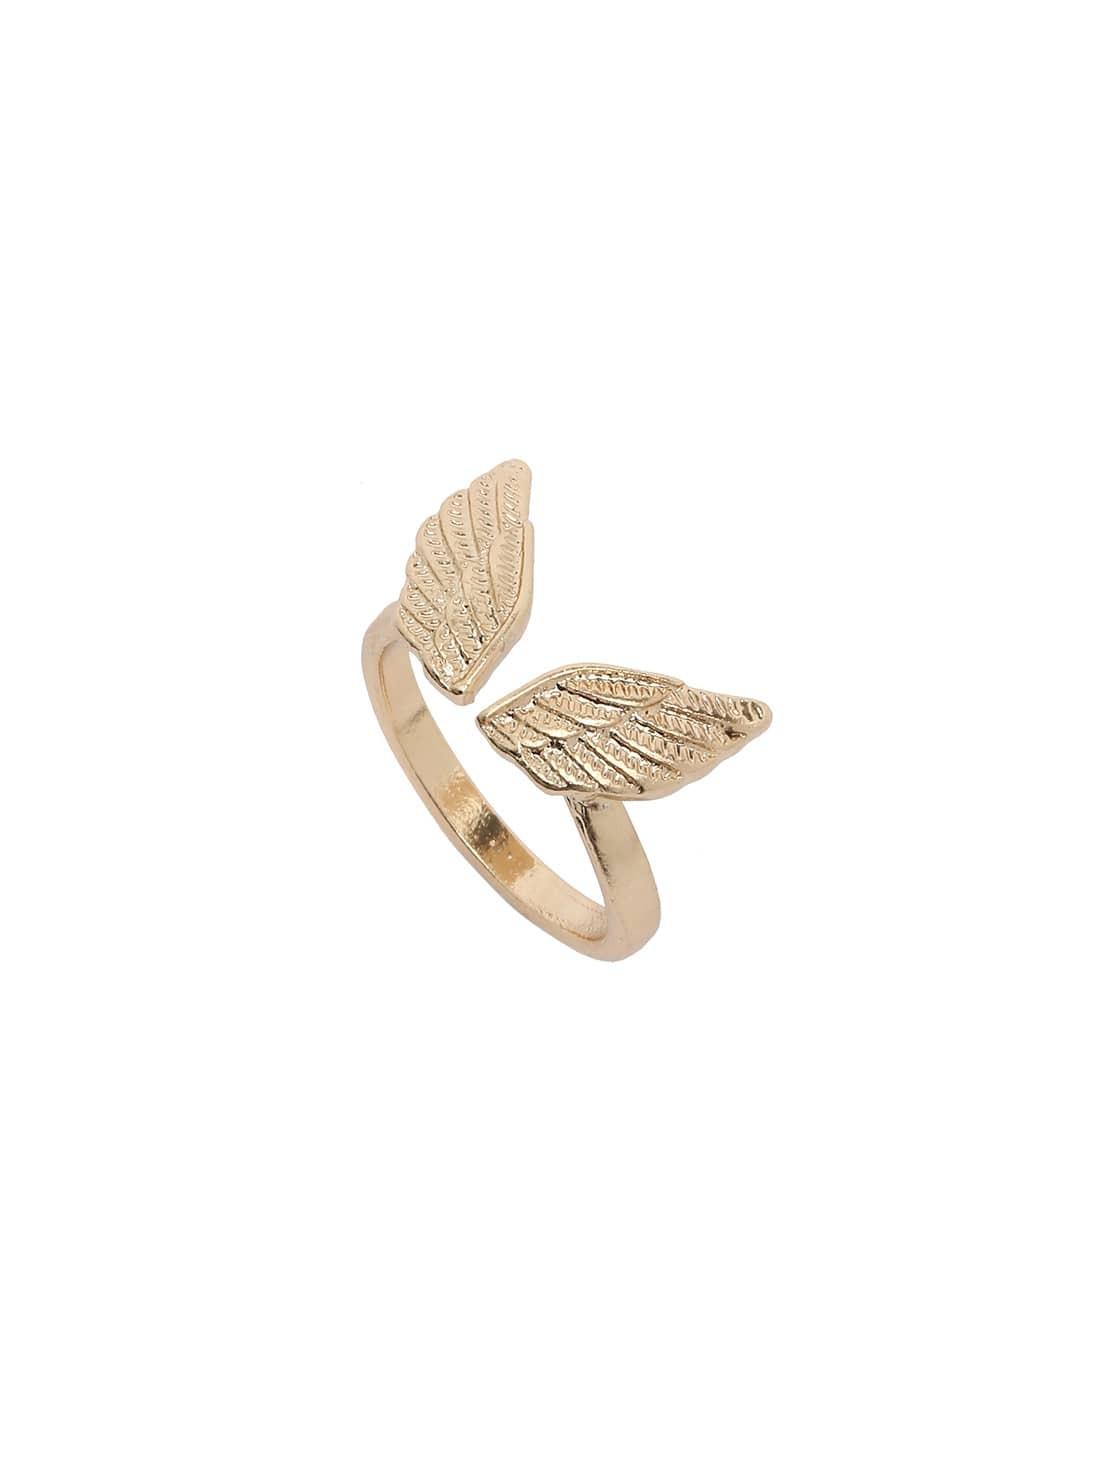 Golden Wing-shaped Ring русское фольклорное шоу золотое кольцо russian folklore show golden ring 2017 07 28t19 00